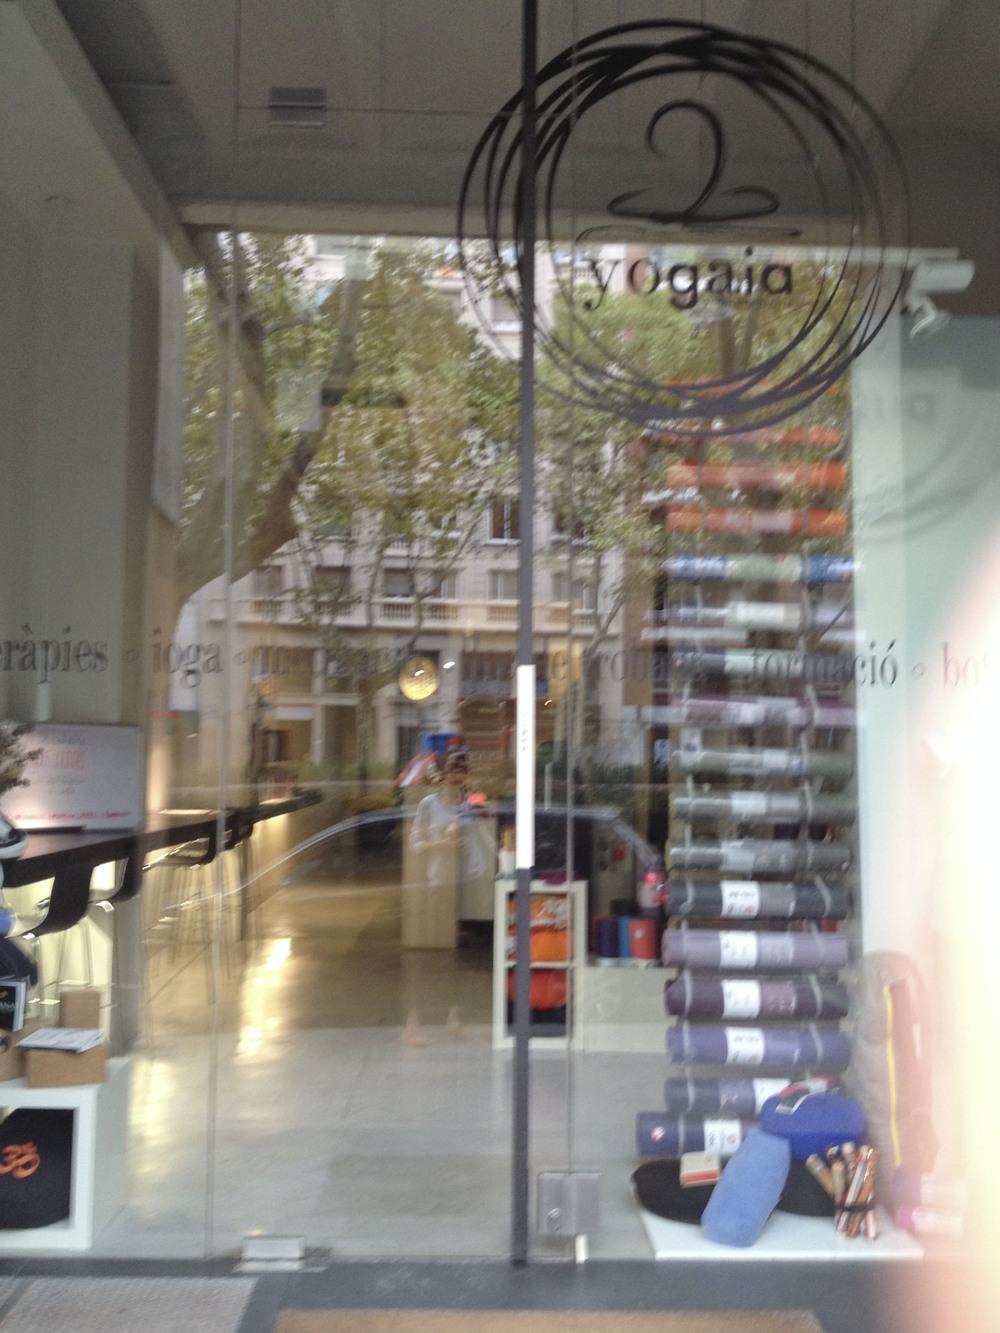 yogaia bcn barcelona yoga studio1991.jpg